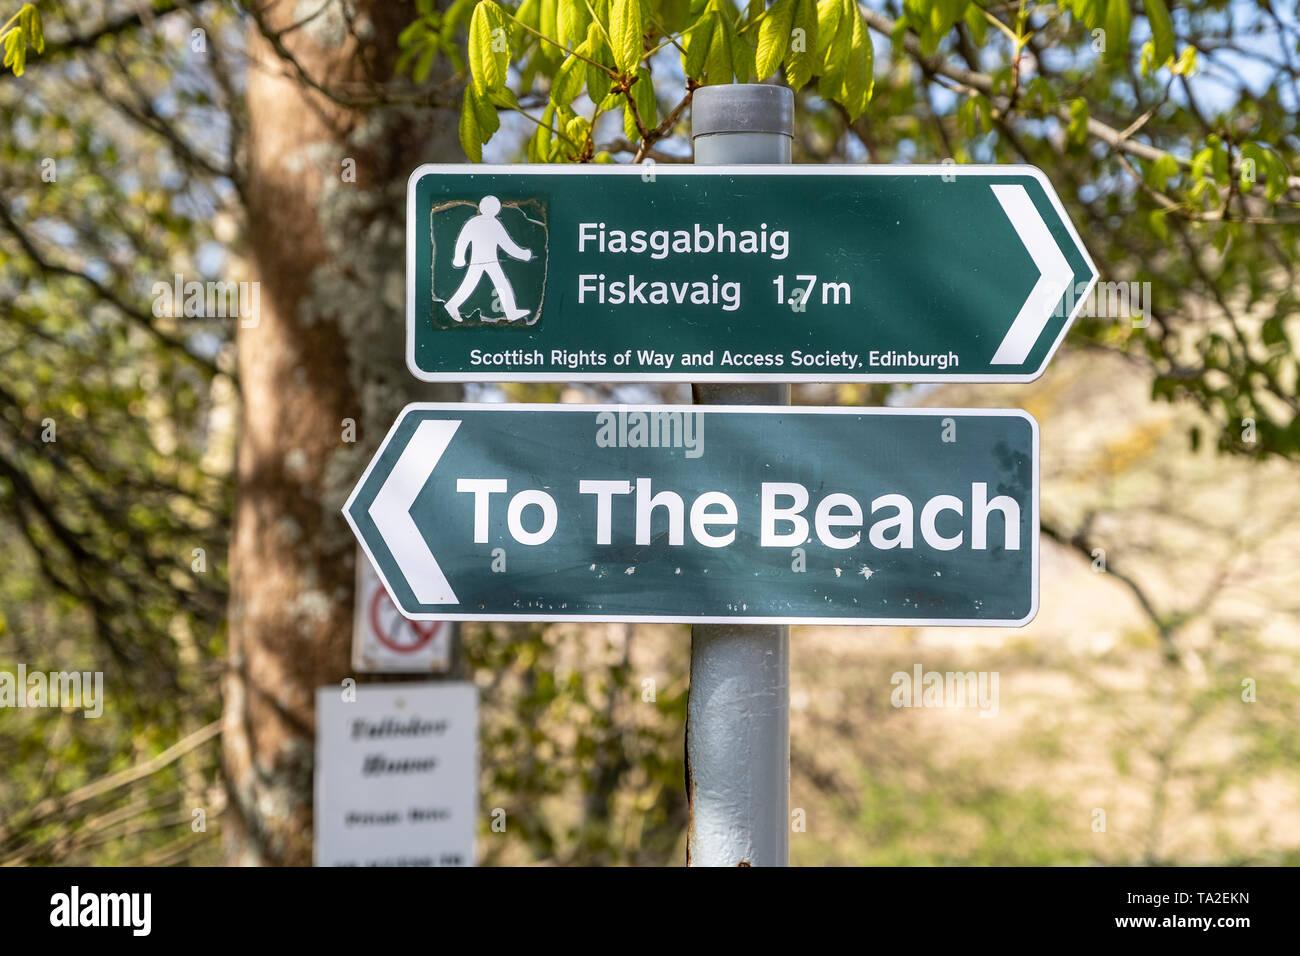 Directional sign to Talisker Beach and Fiasgabhaig Fiskavaig. Skye, Scotland, UK Stock Photo